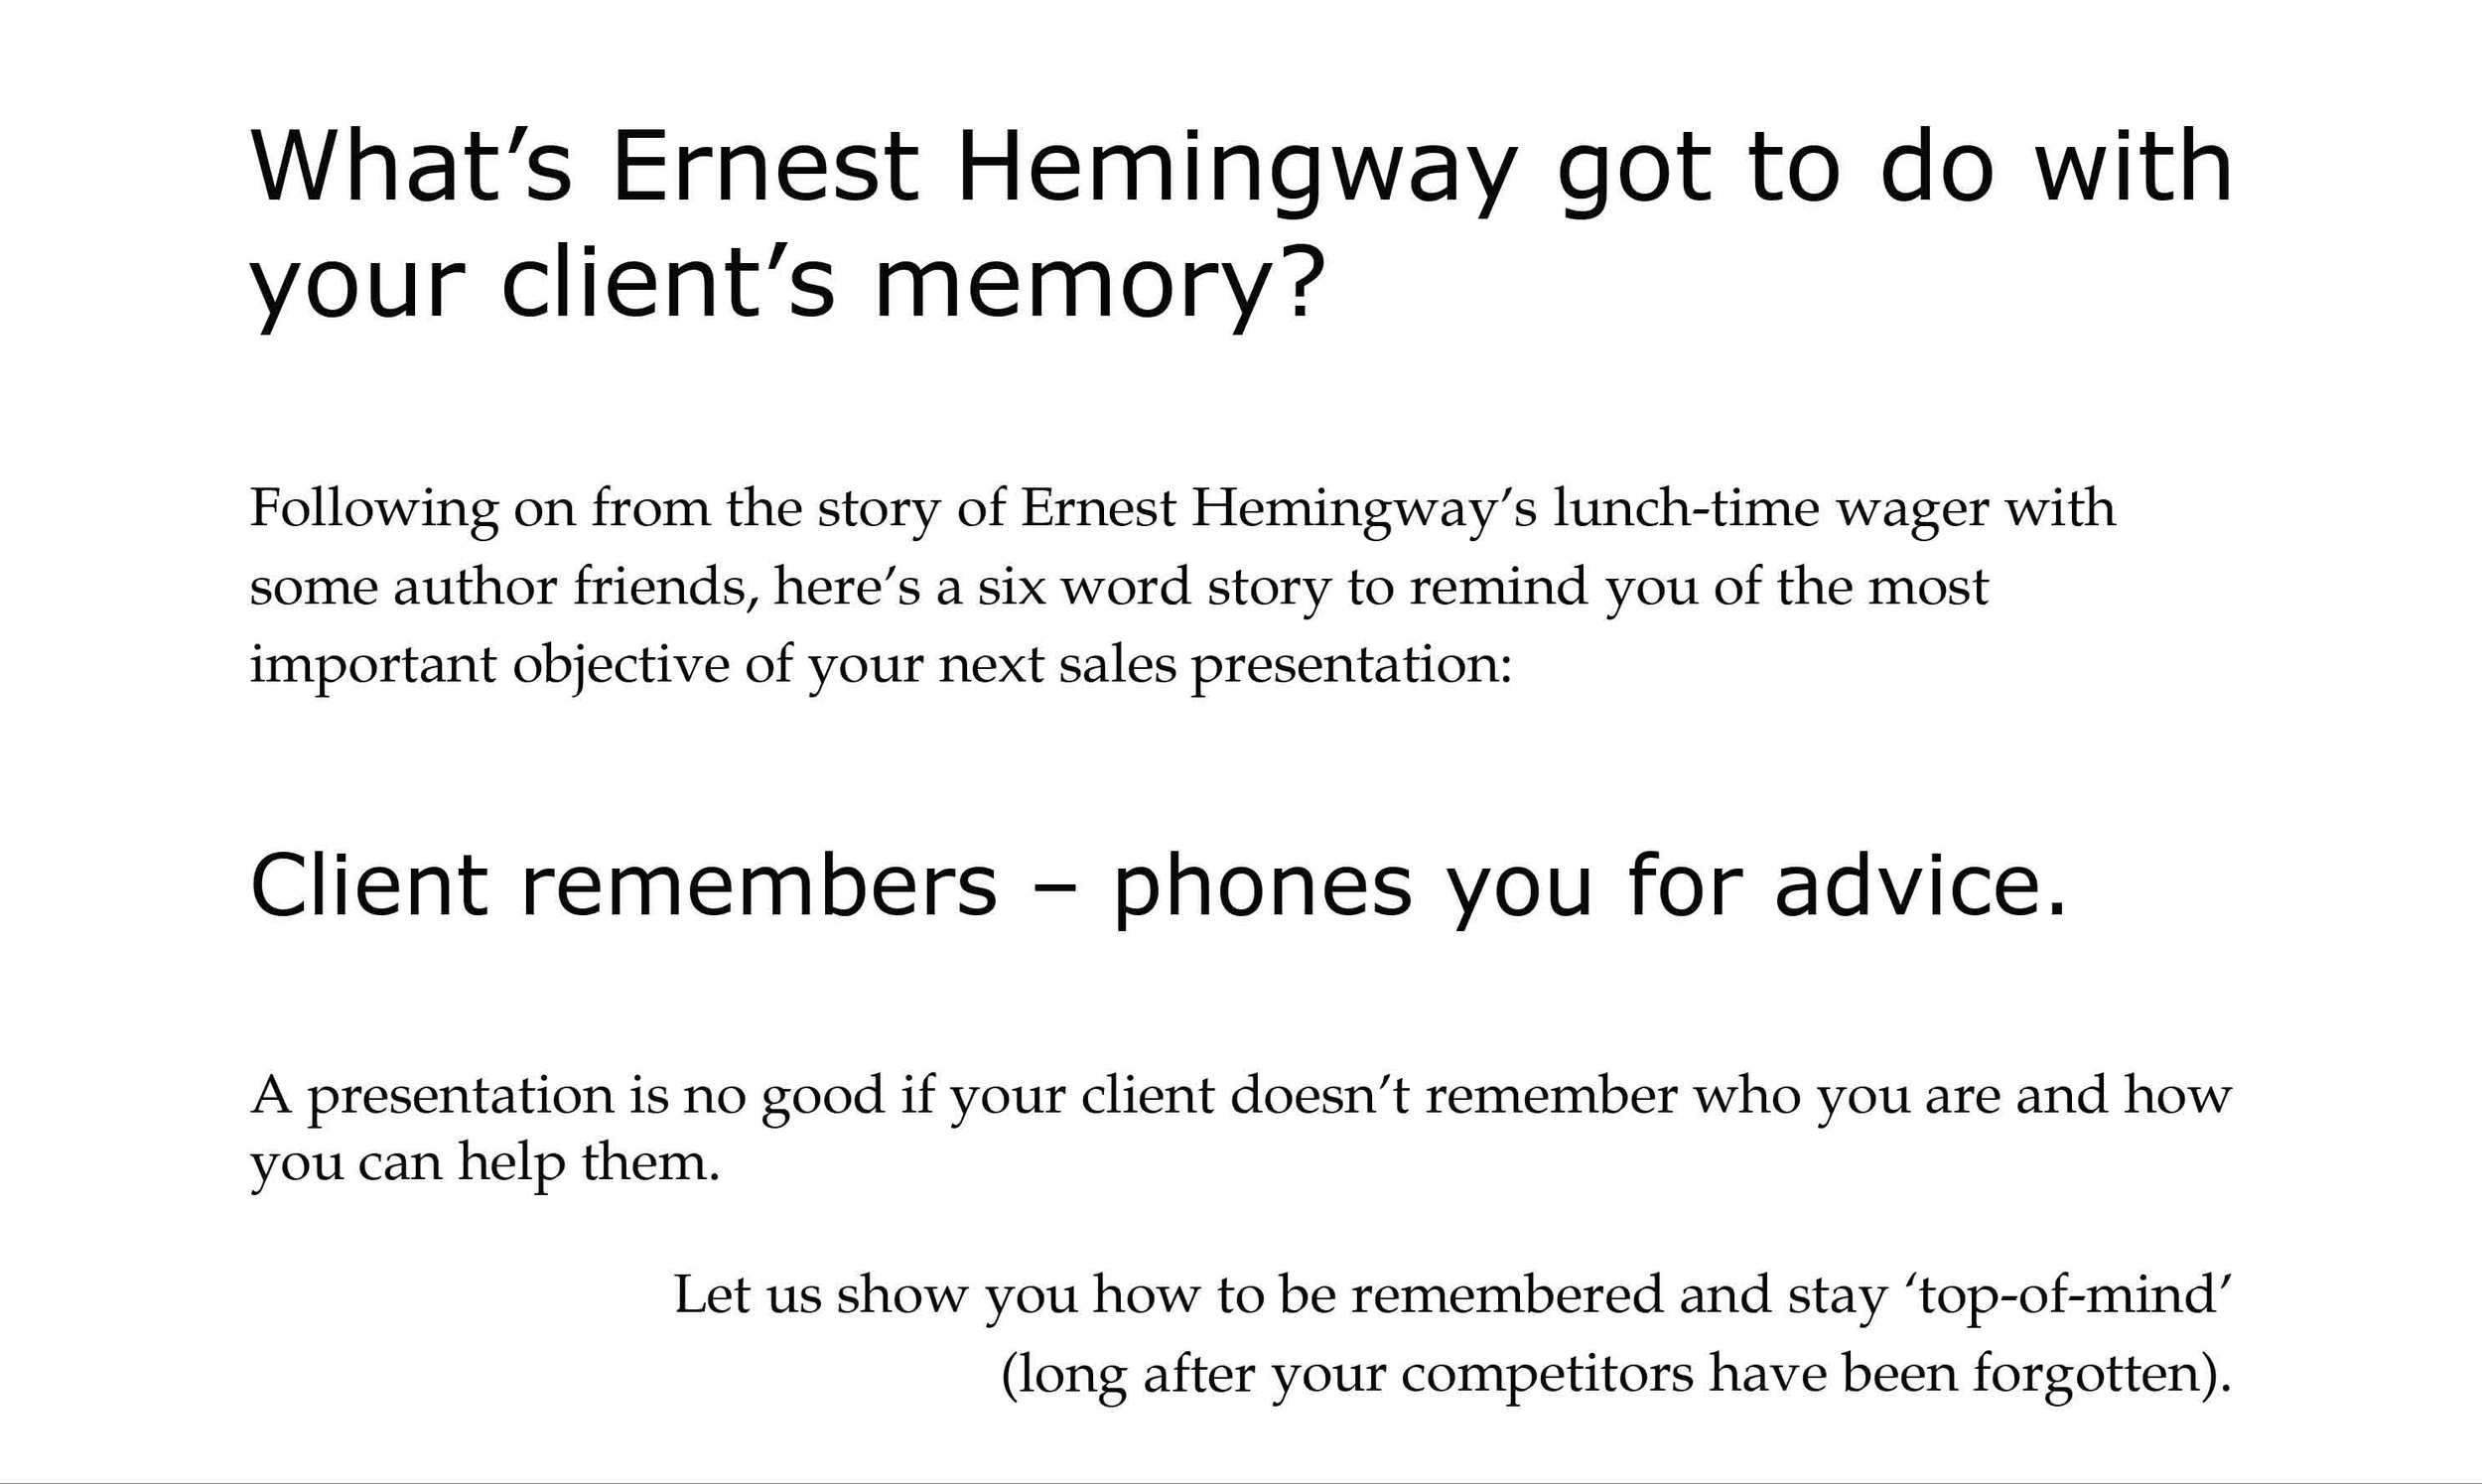 Clients Remember